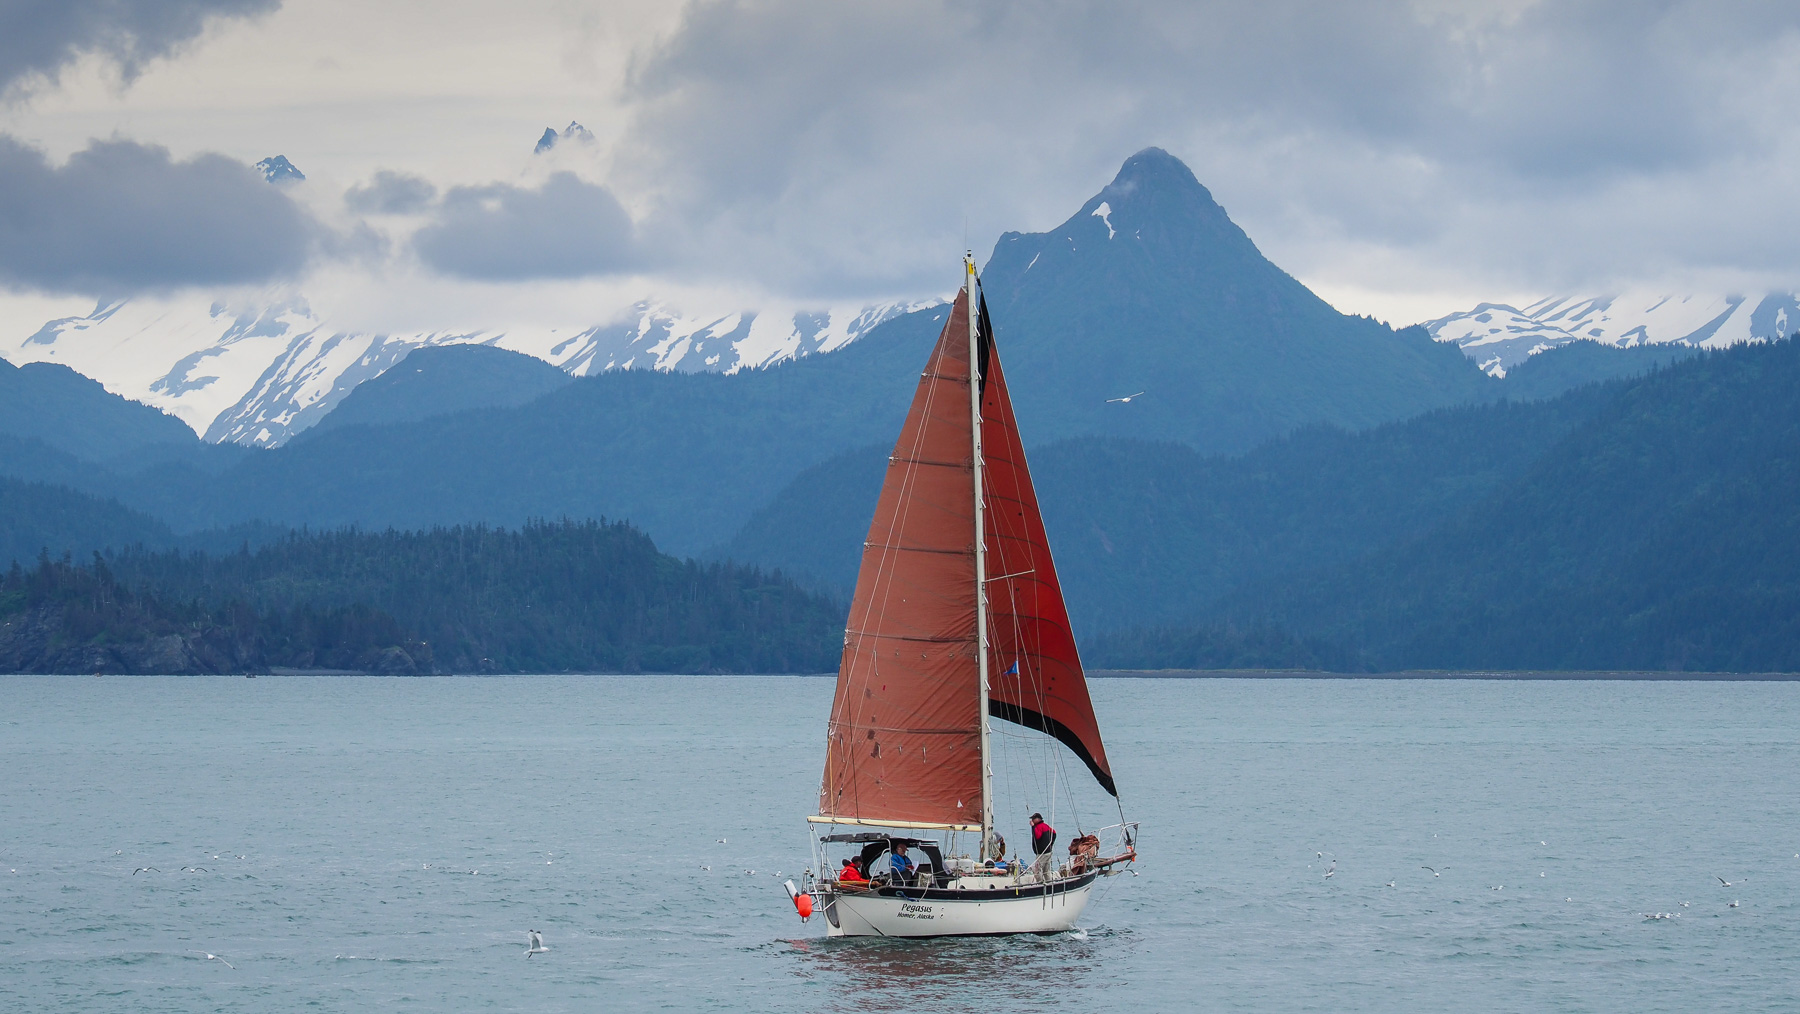 Serie wie die Leute in Alaska den Sommer verbringen: Segeln